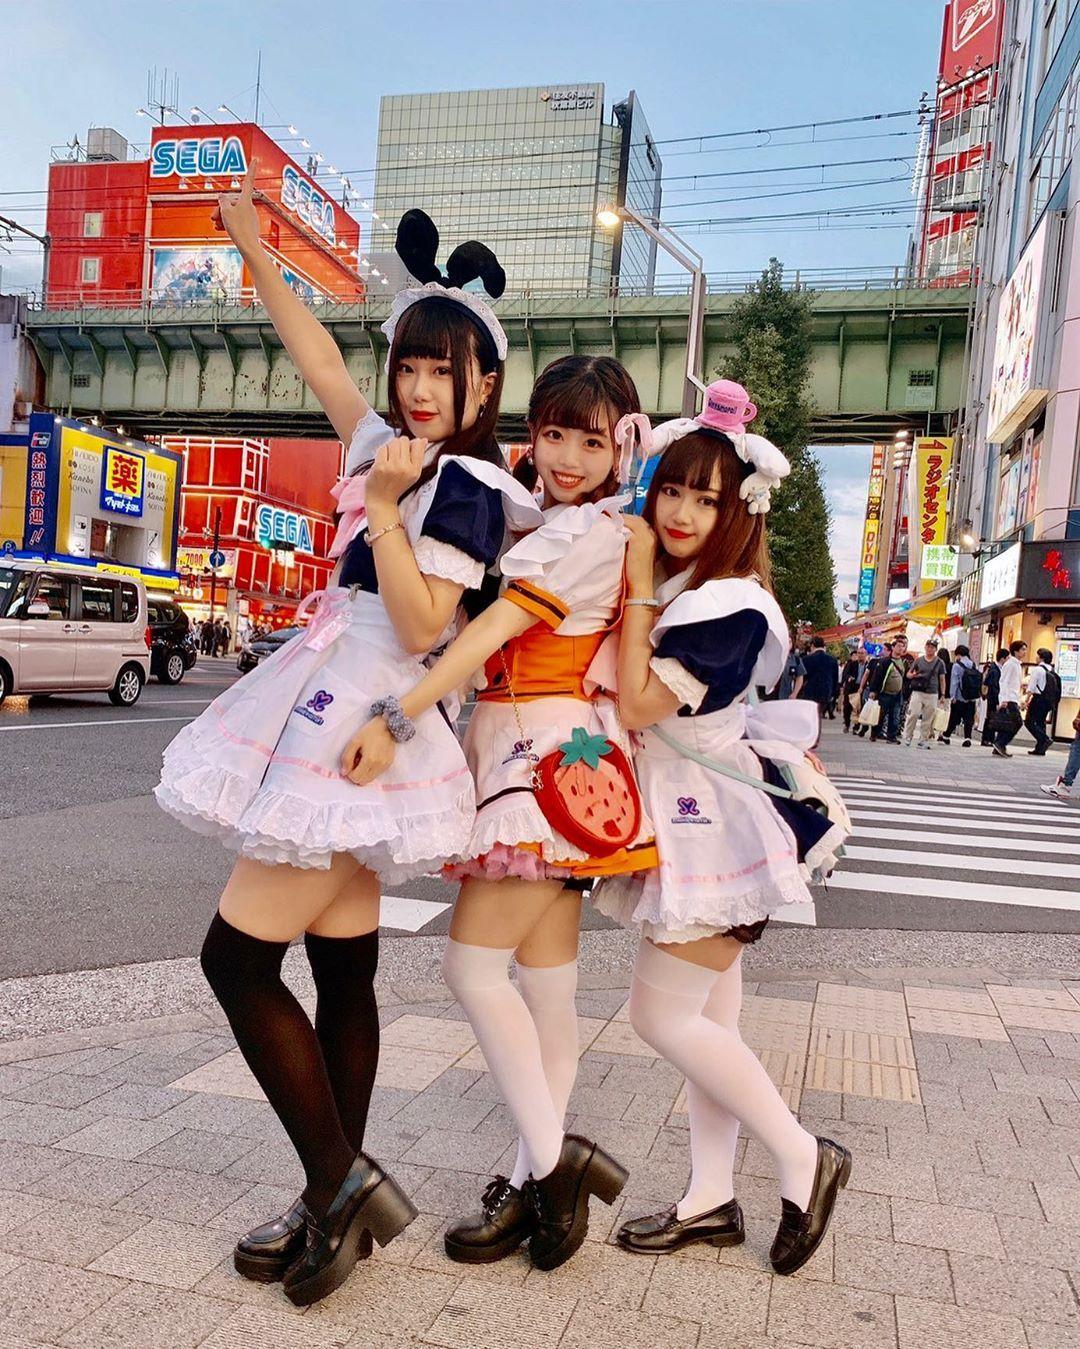 tokyo tour maid cafe